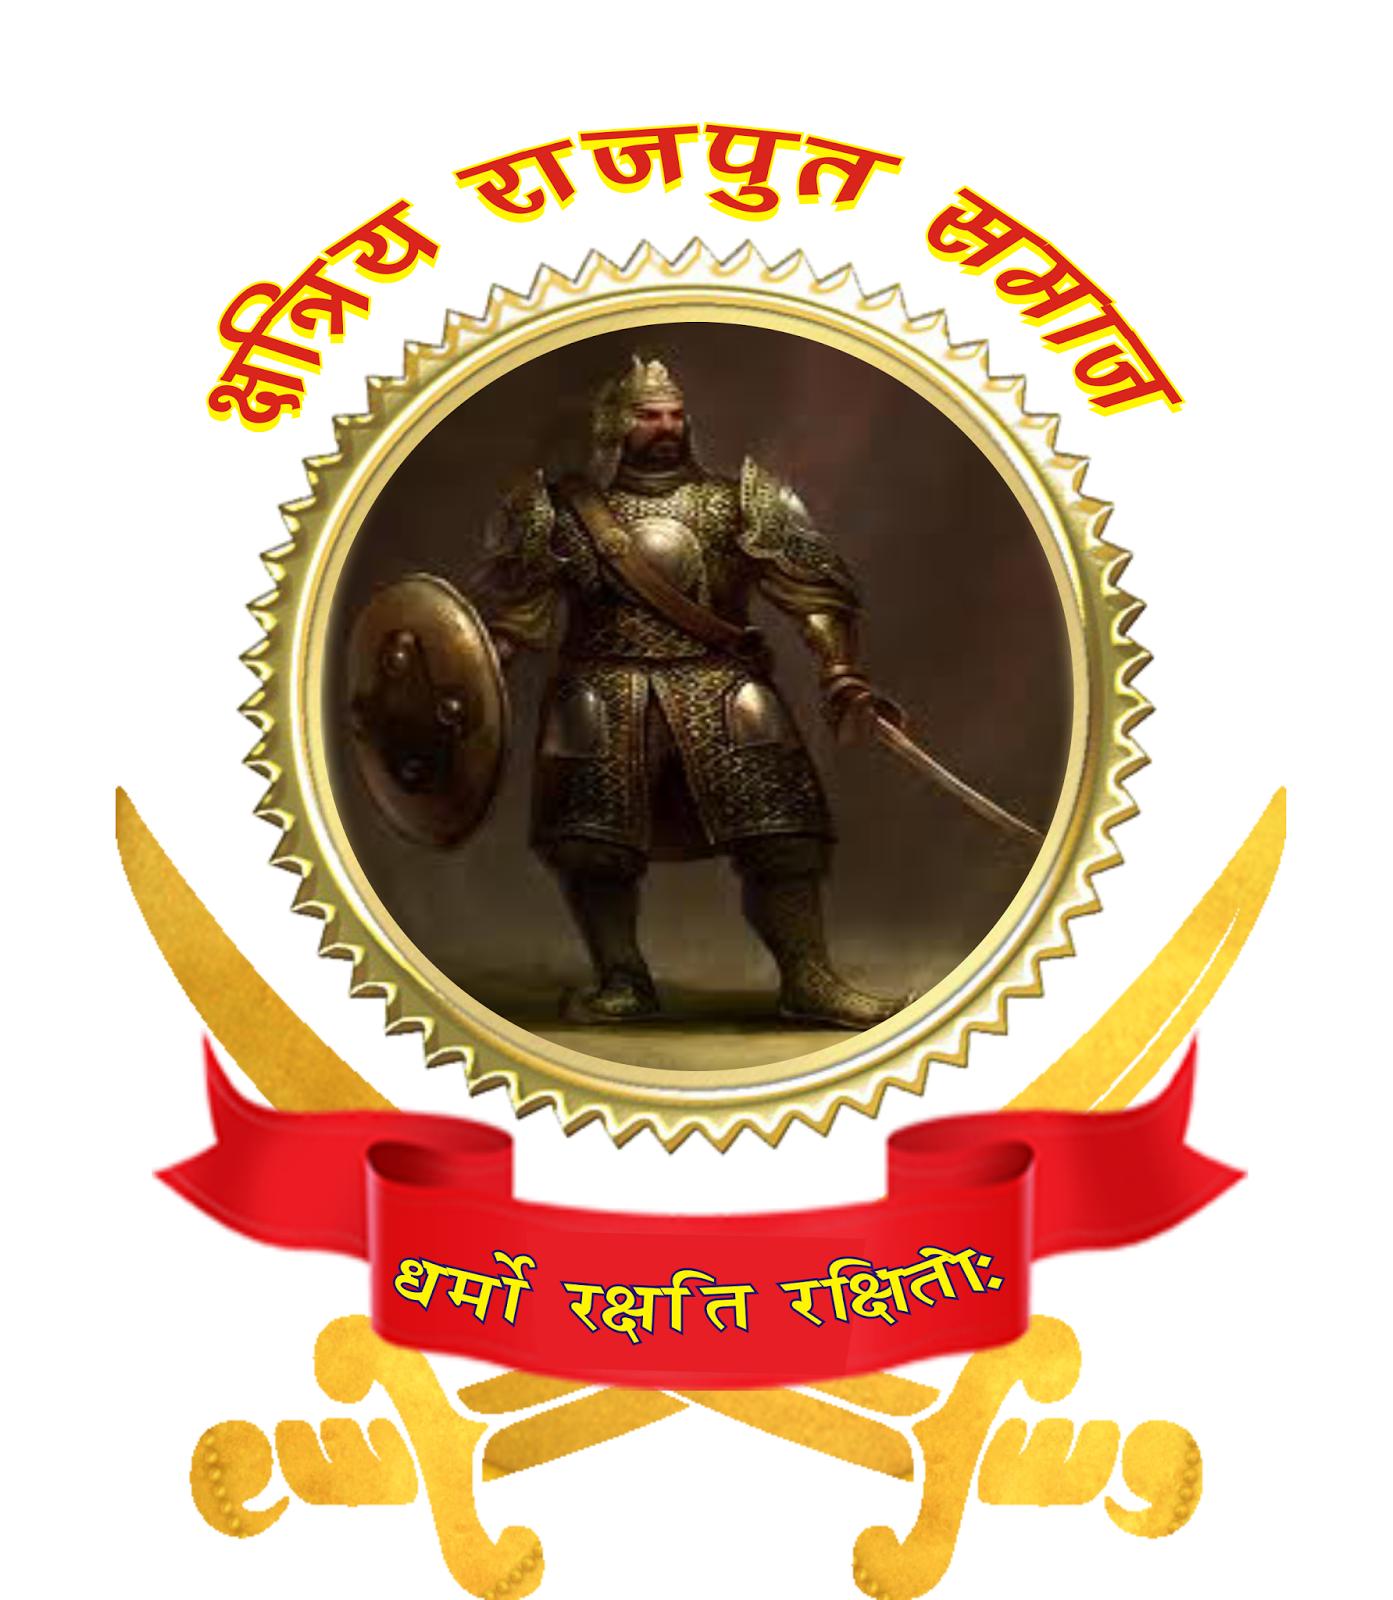 Rajputana Hindi Status